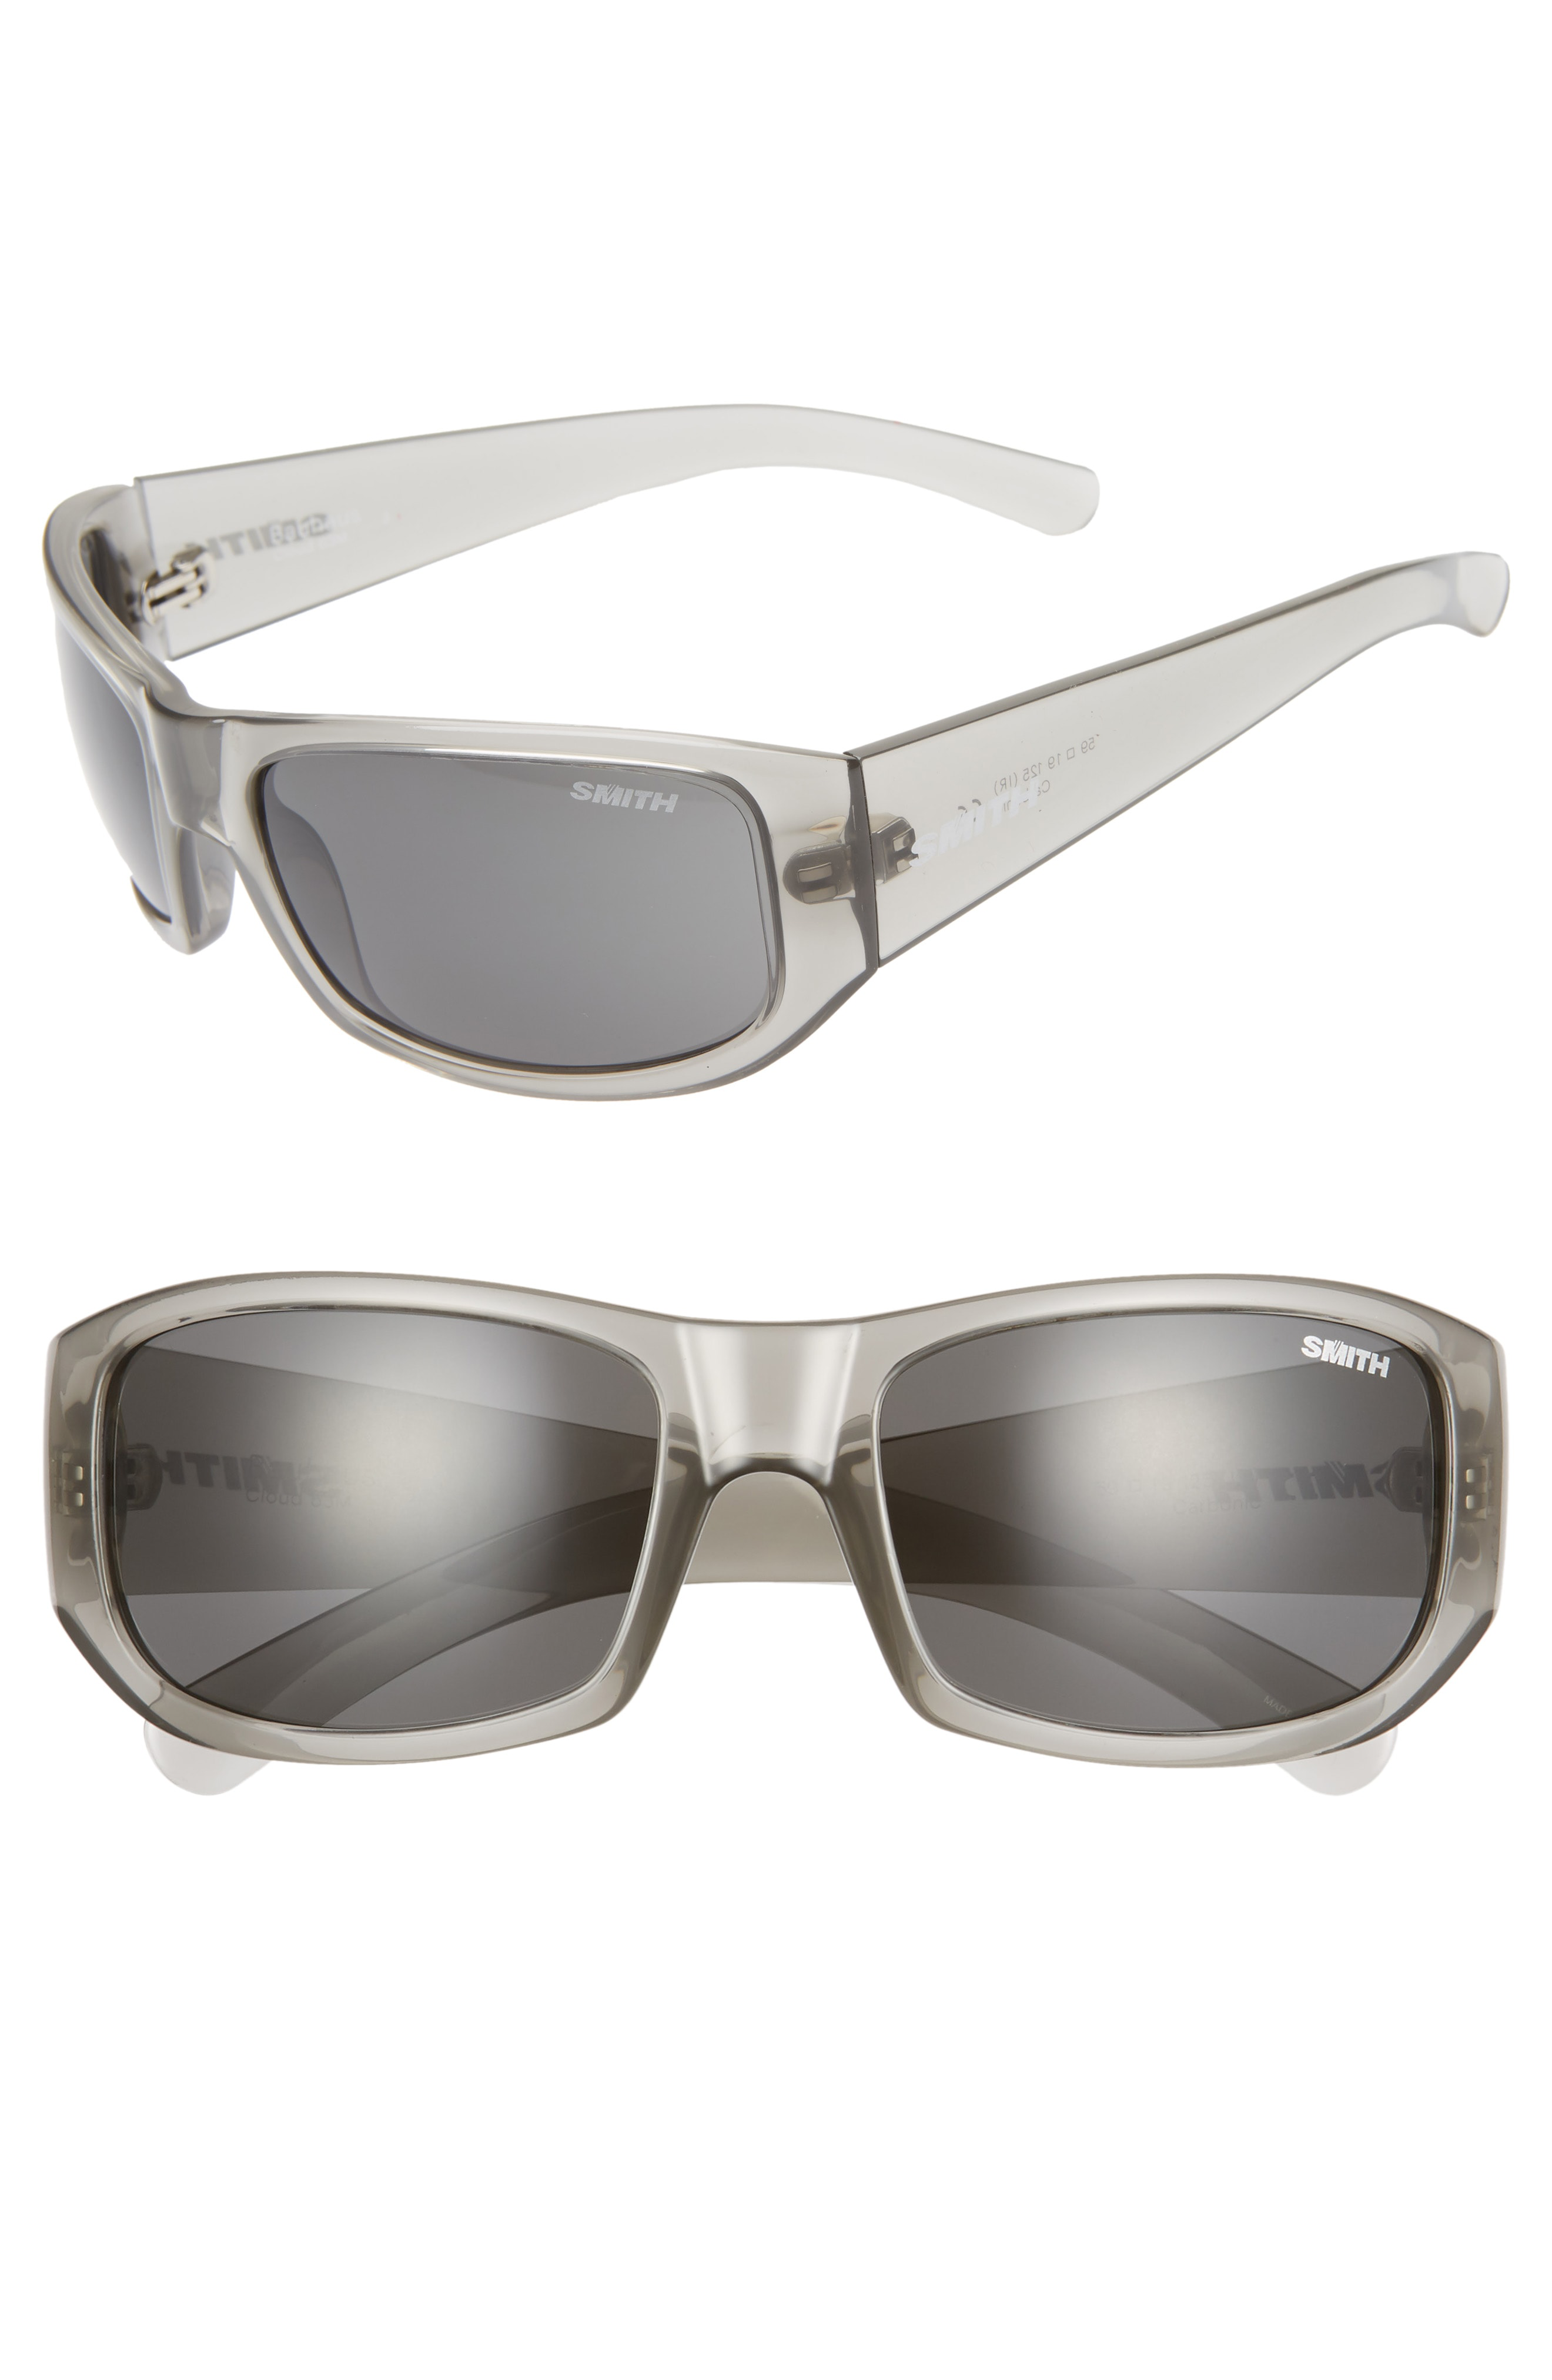 e30bf837ed Smith Bauhaus 59Mm Chromapop(Tm) Polarized Wraparound Sunglasses - Grey  Cloud  Grey